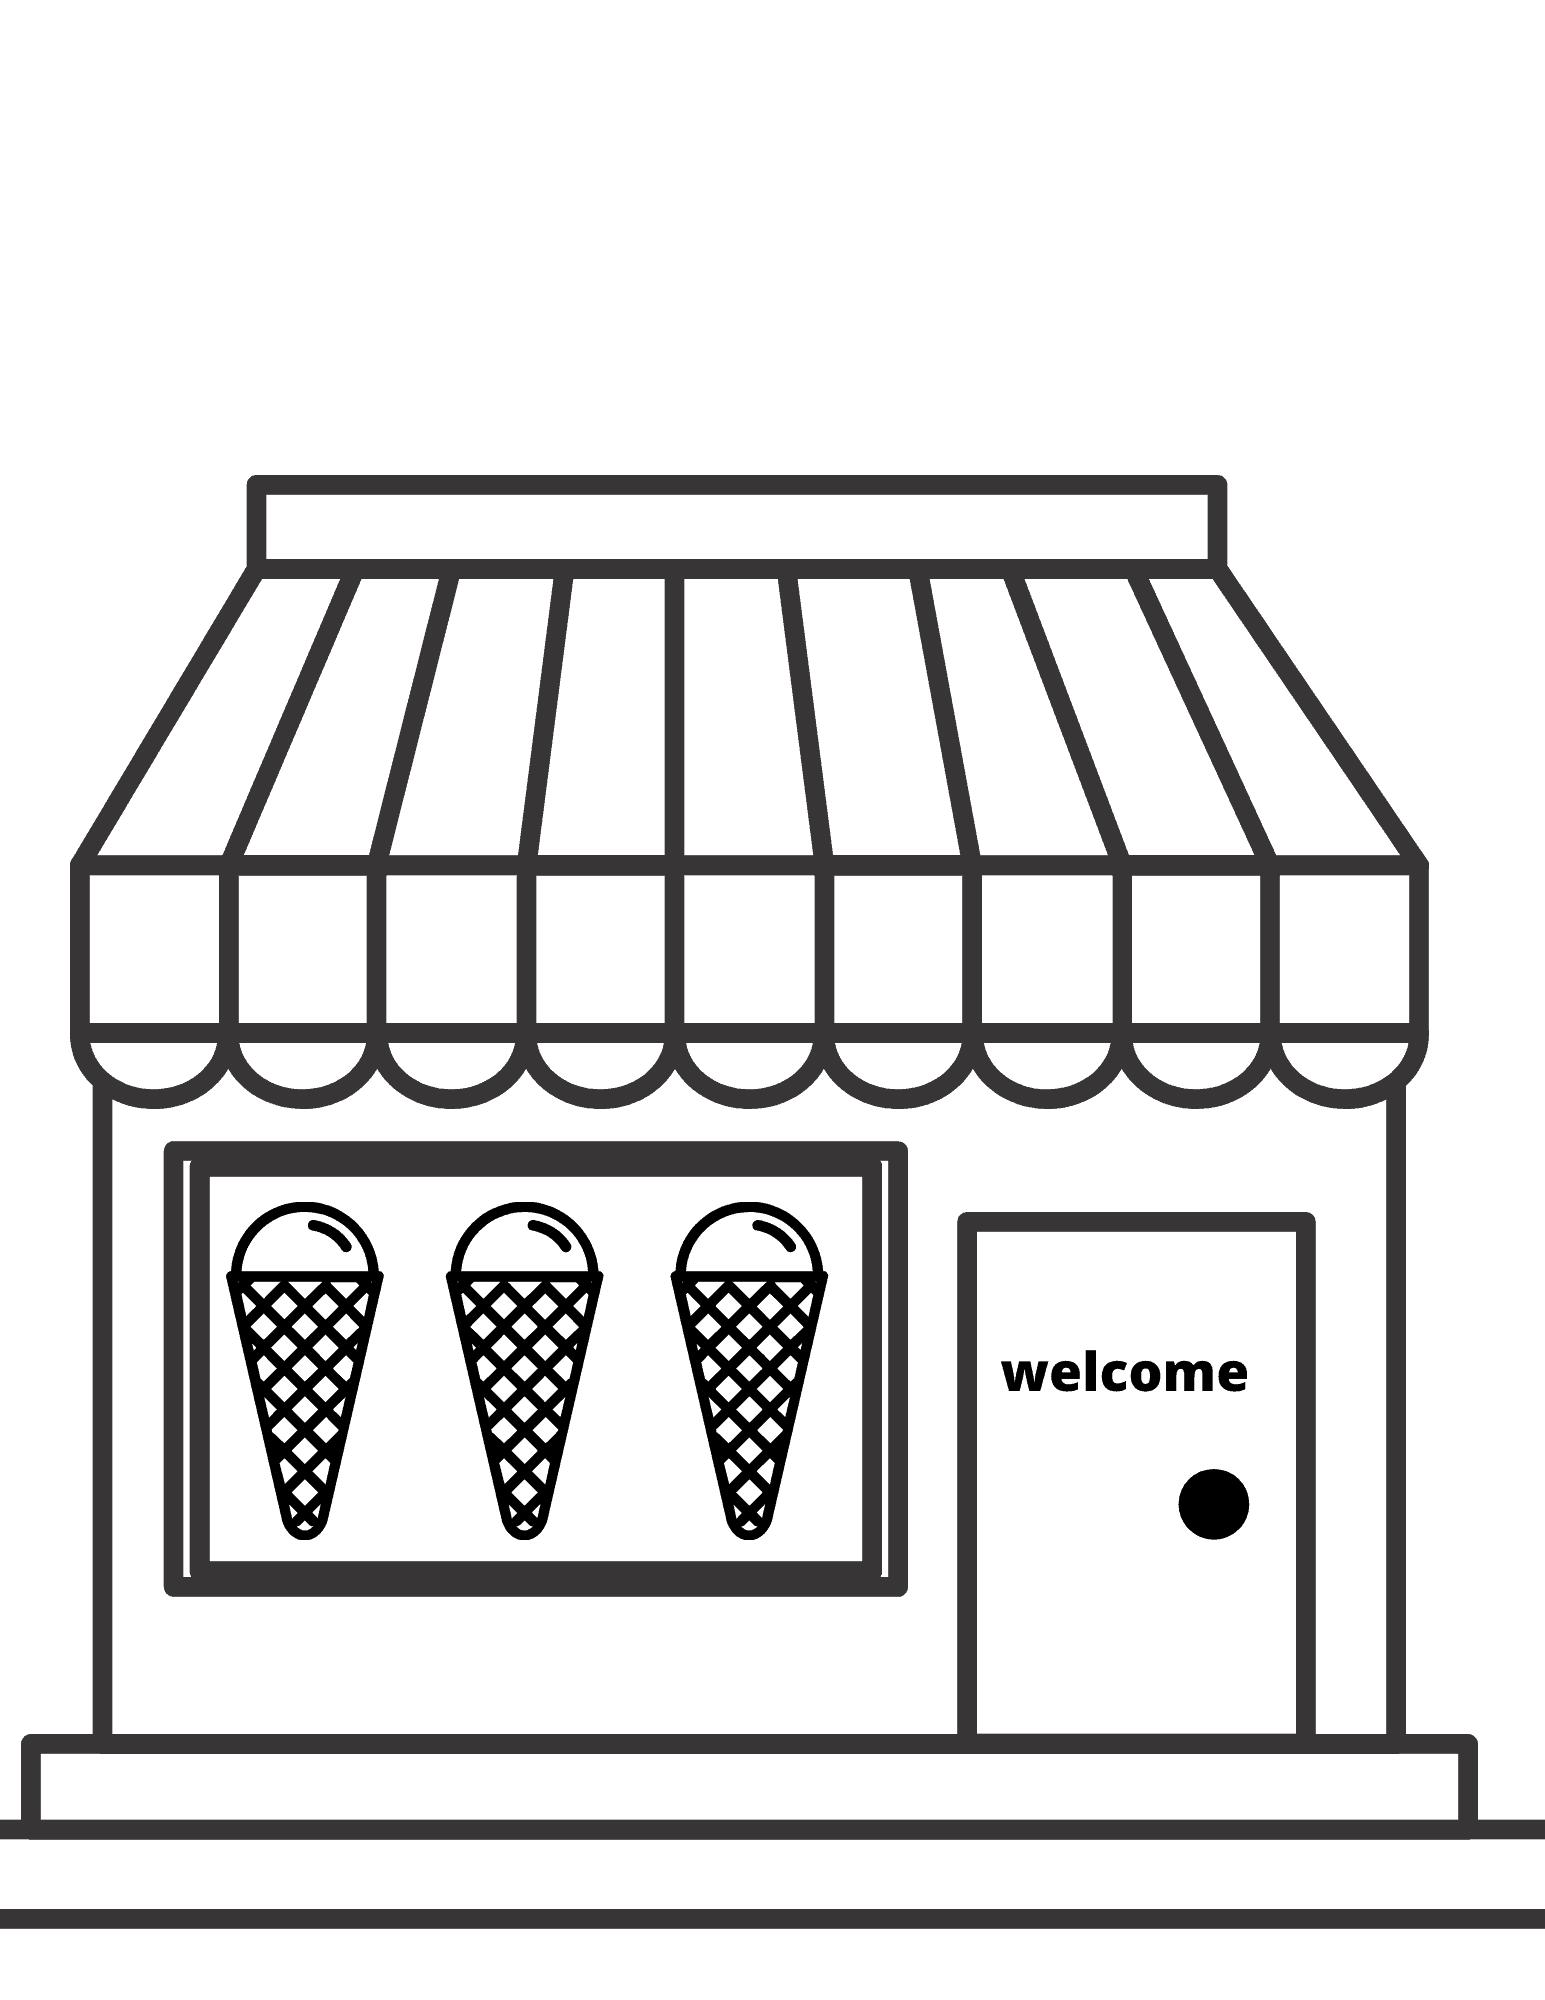 Ice Cream shop coloring page